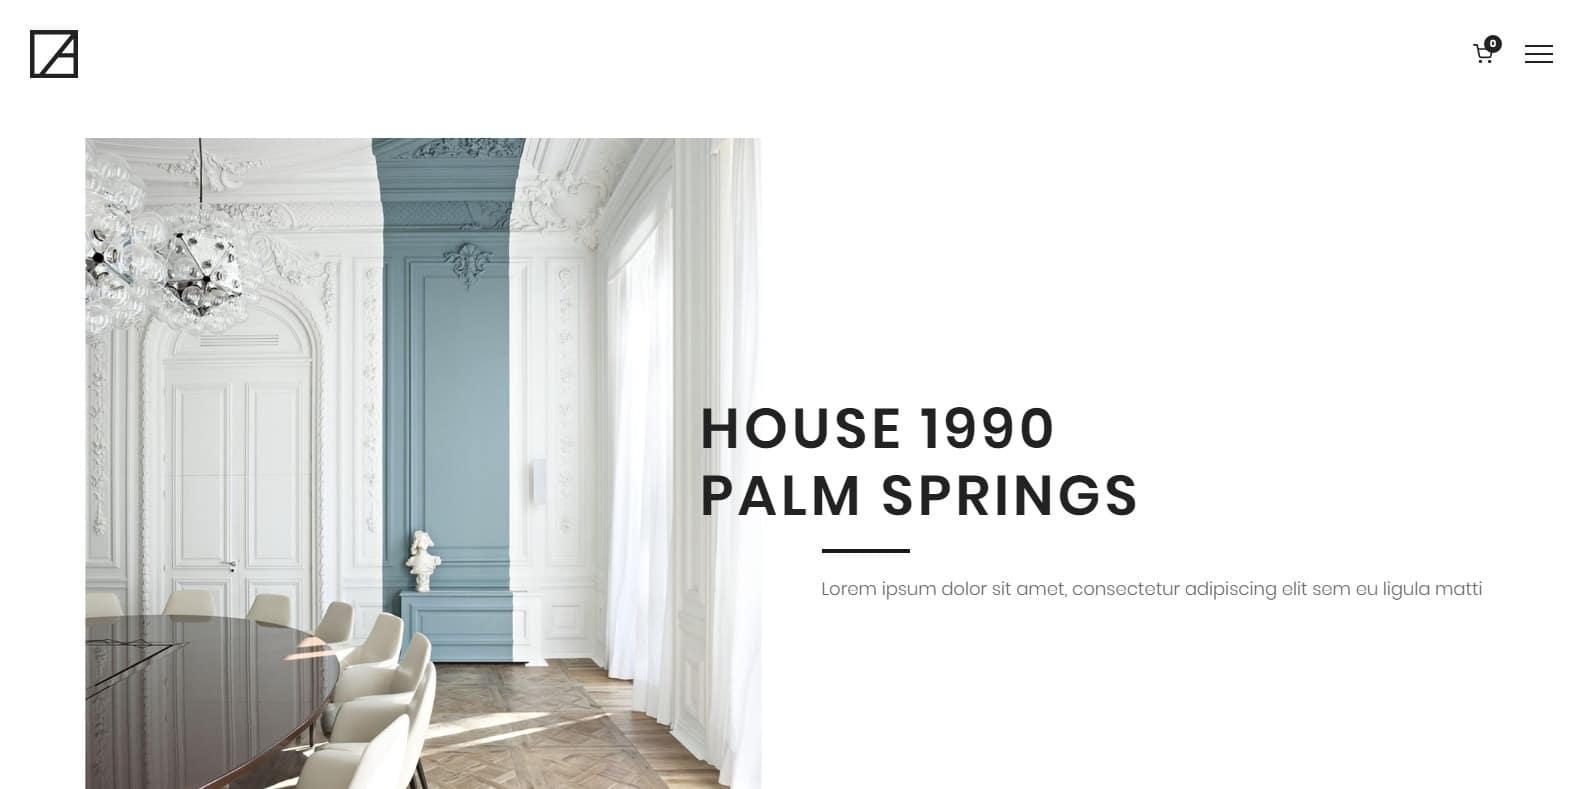 architekton-home-staging-website-template